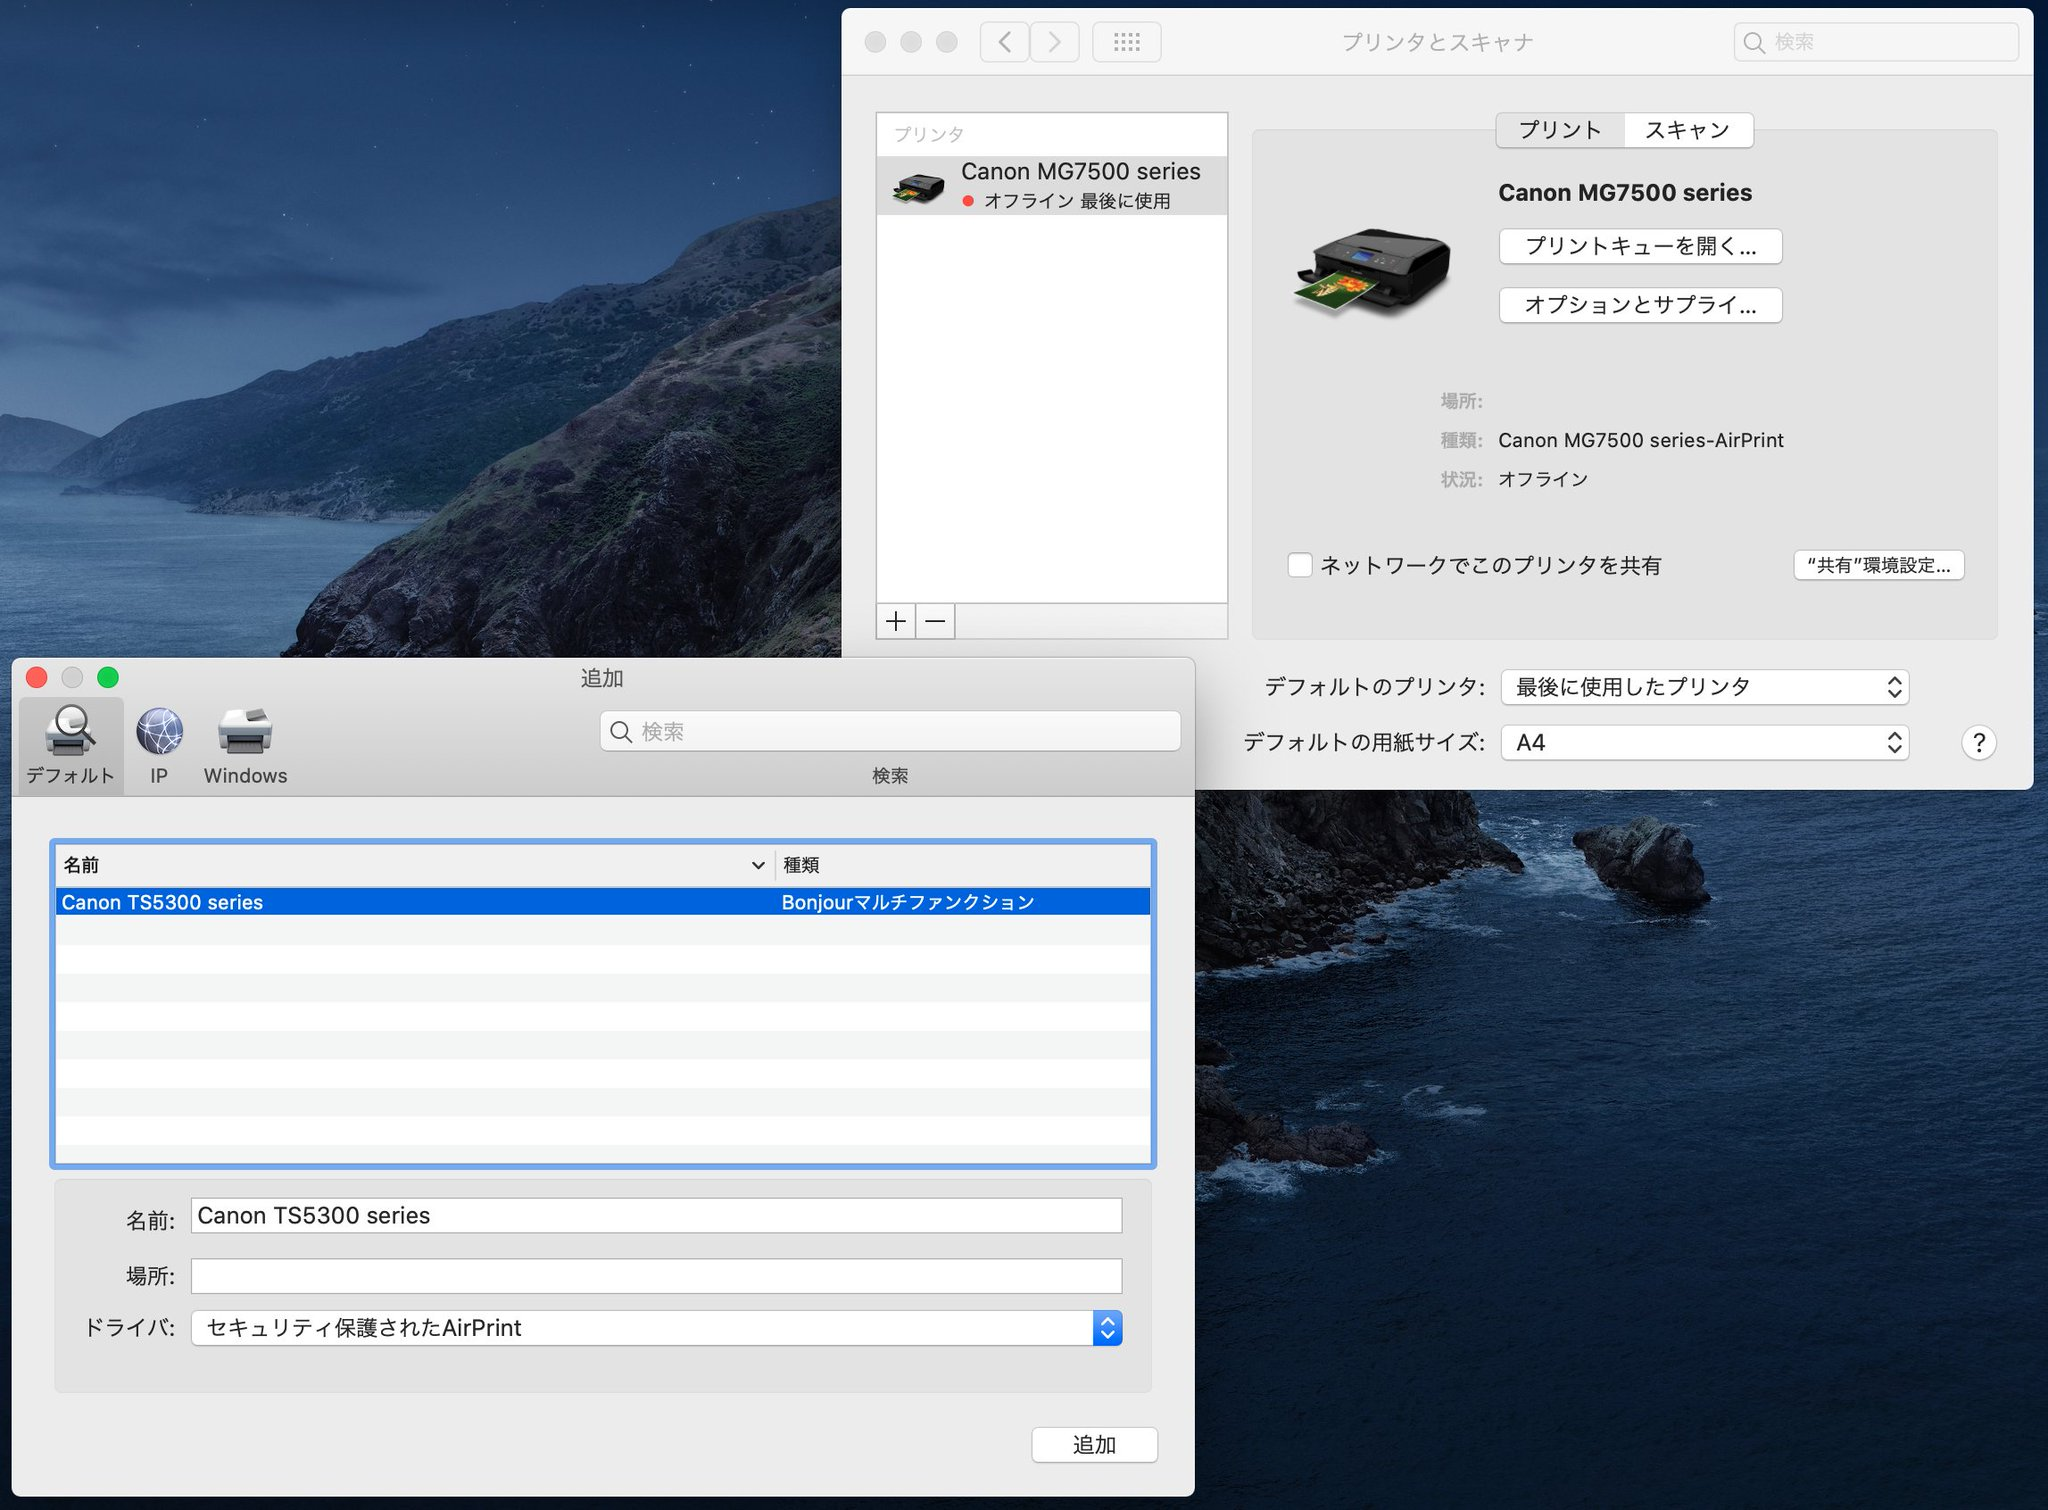 macOS ではじめて AirPrint プリンタ追加。Canon PIXUS TS5330 でちゃんと印刷できた。 https://t.co/5XUWysyMjj